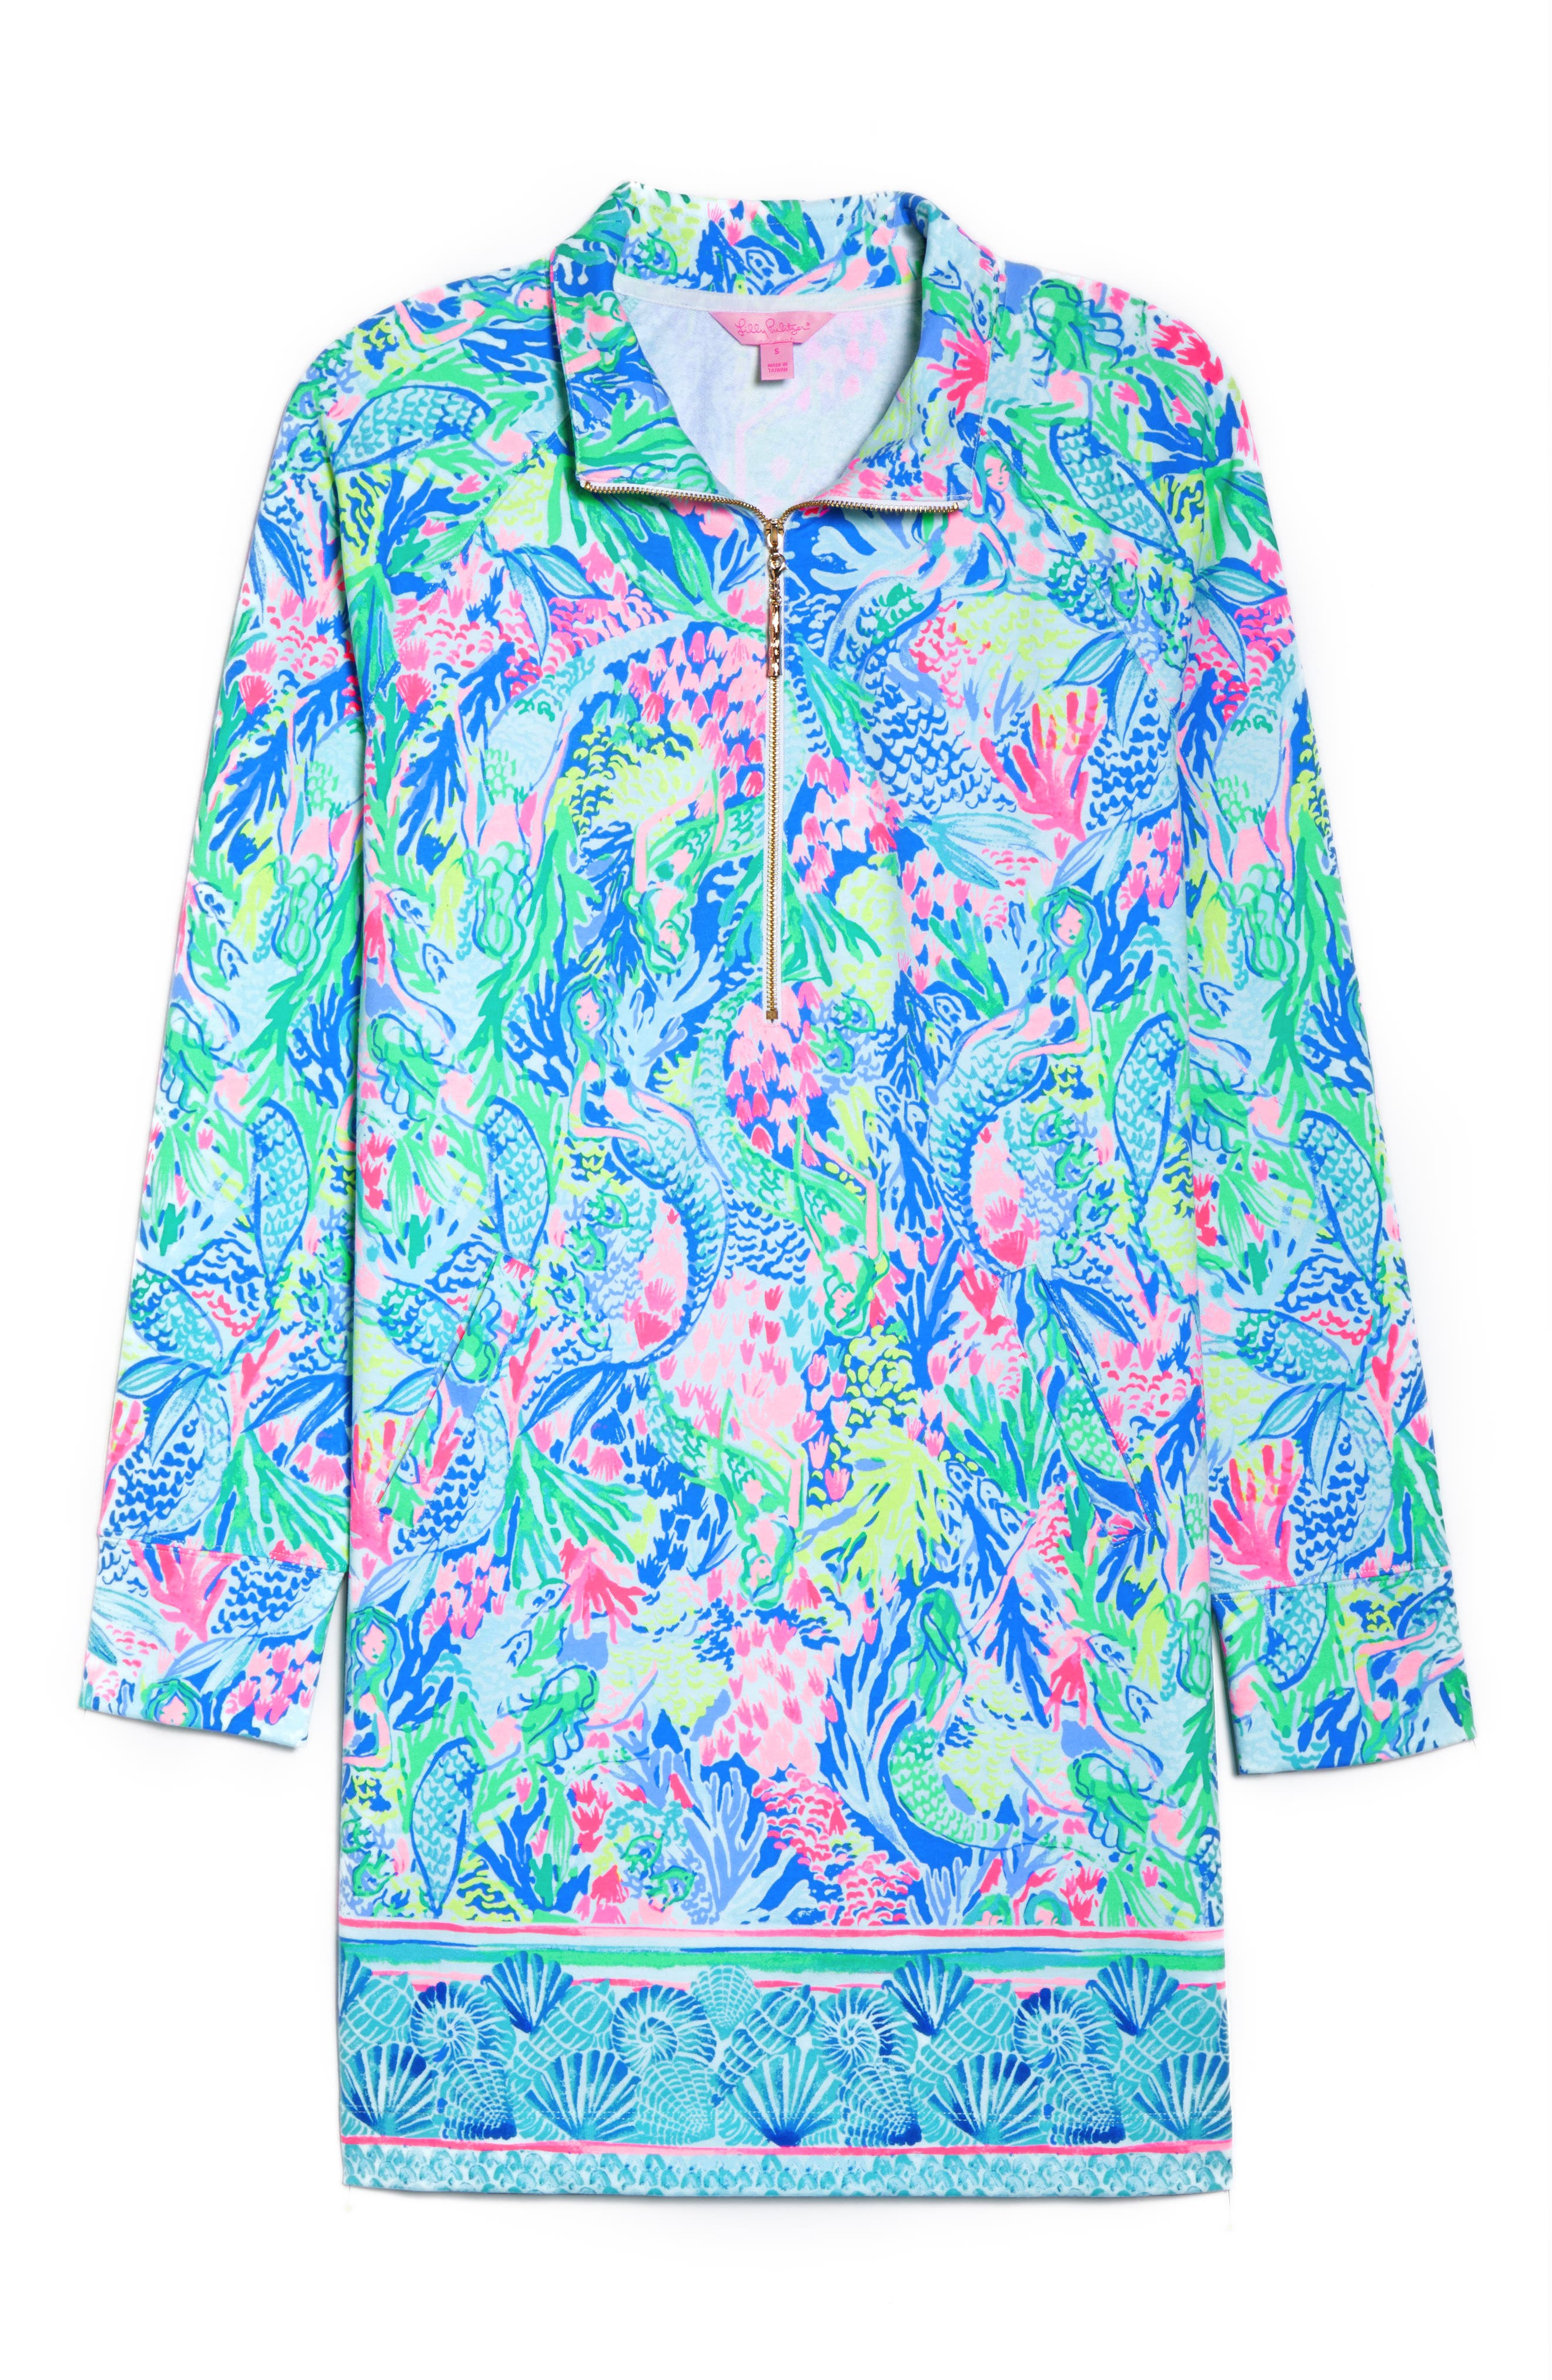 Lilly Pulitzer Skipper Shift Dress,                             Alternate thumbnail 6, color,                             Multi Mermaids Cove